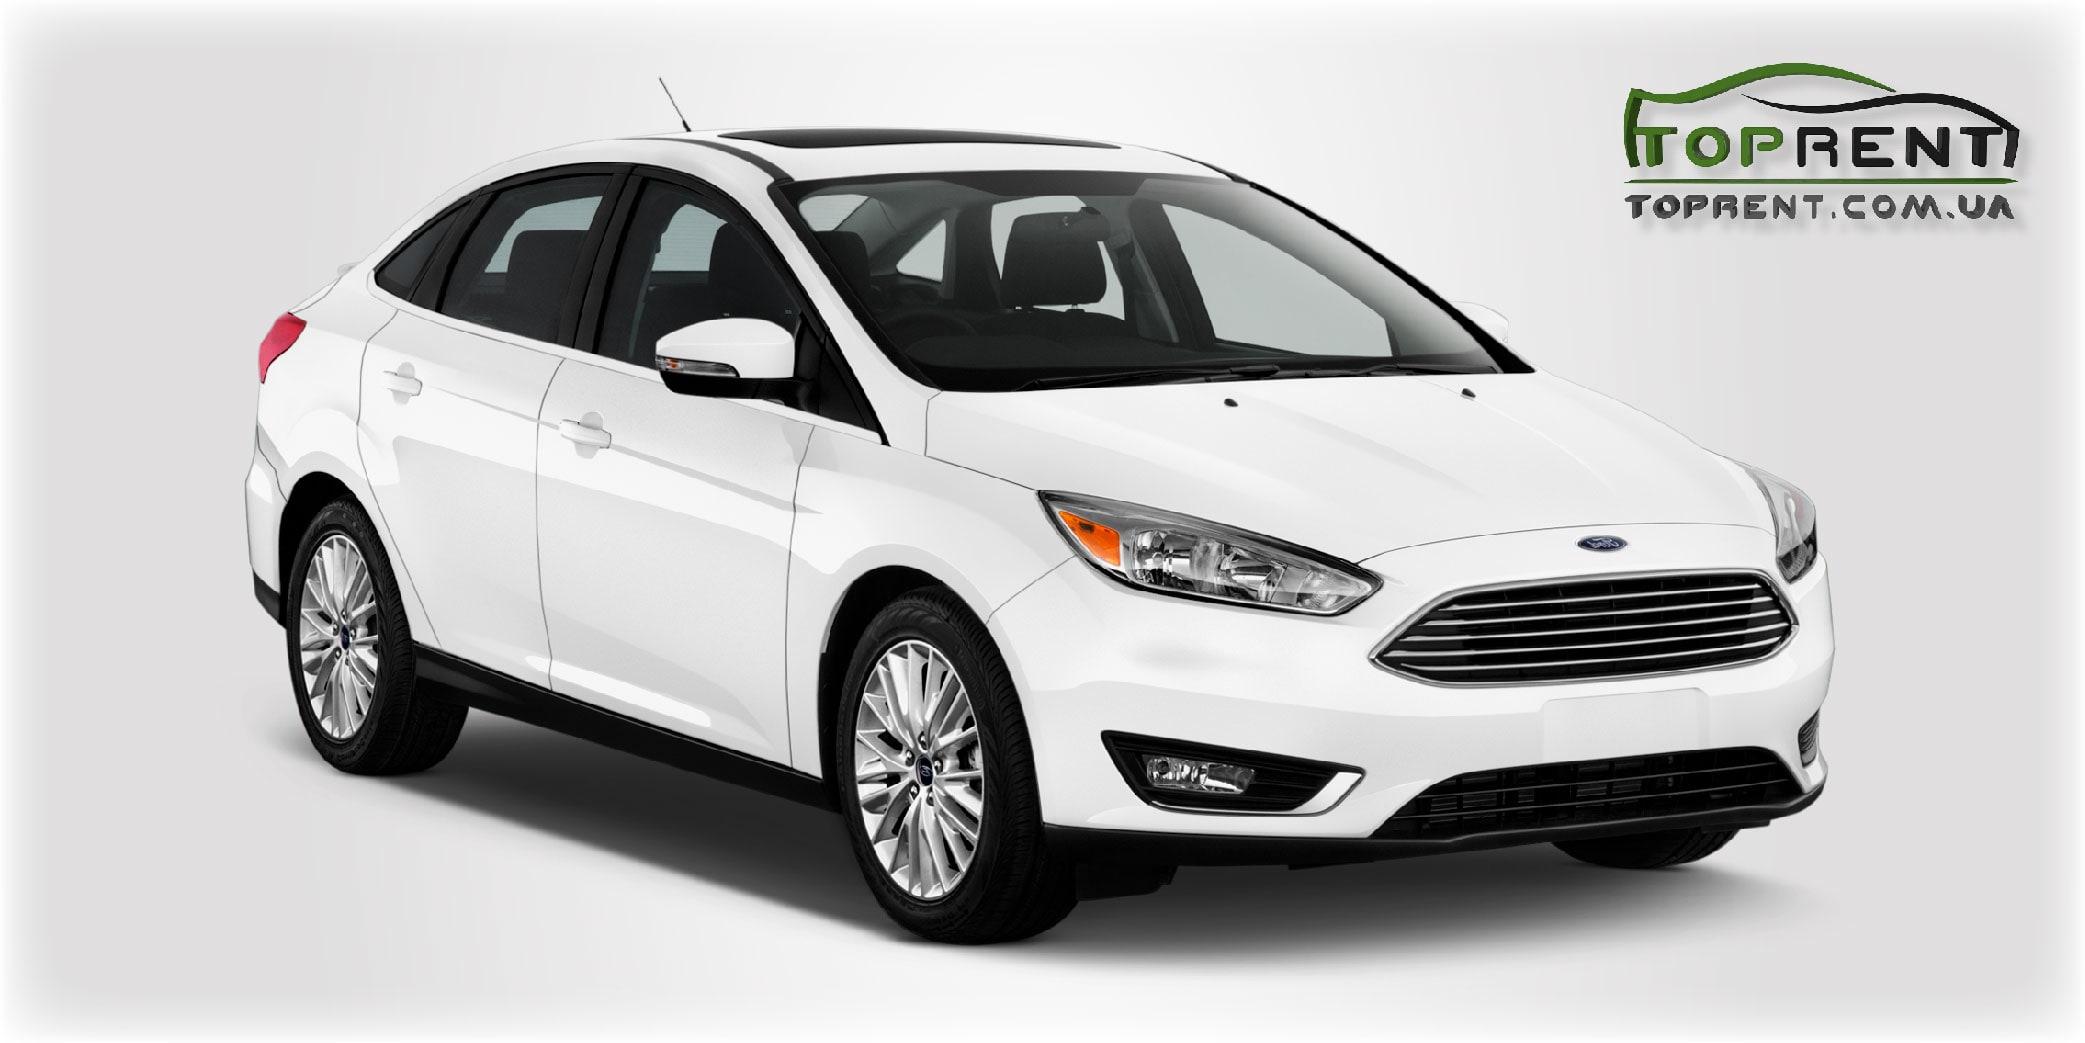 Ford-Focus-ecoboost-arenda-prokat-TopRent.com.ua